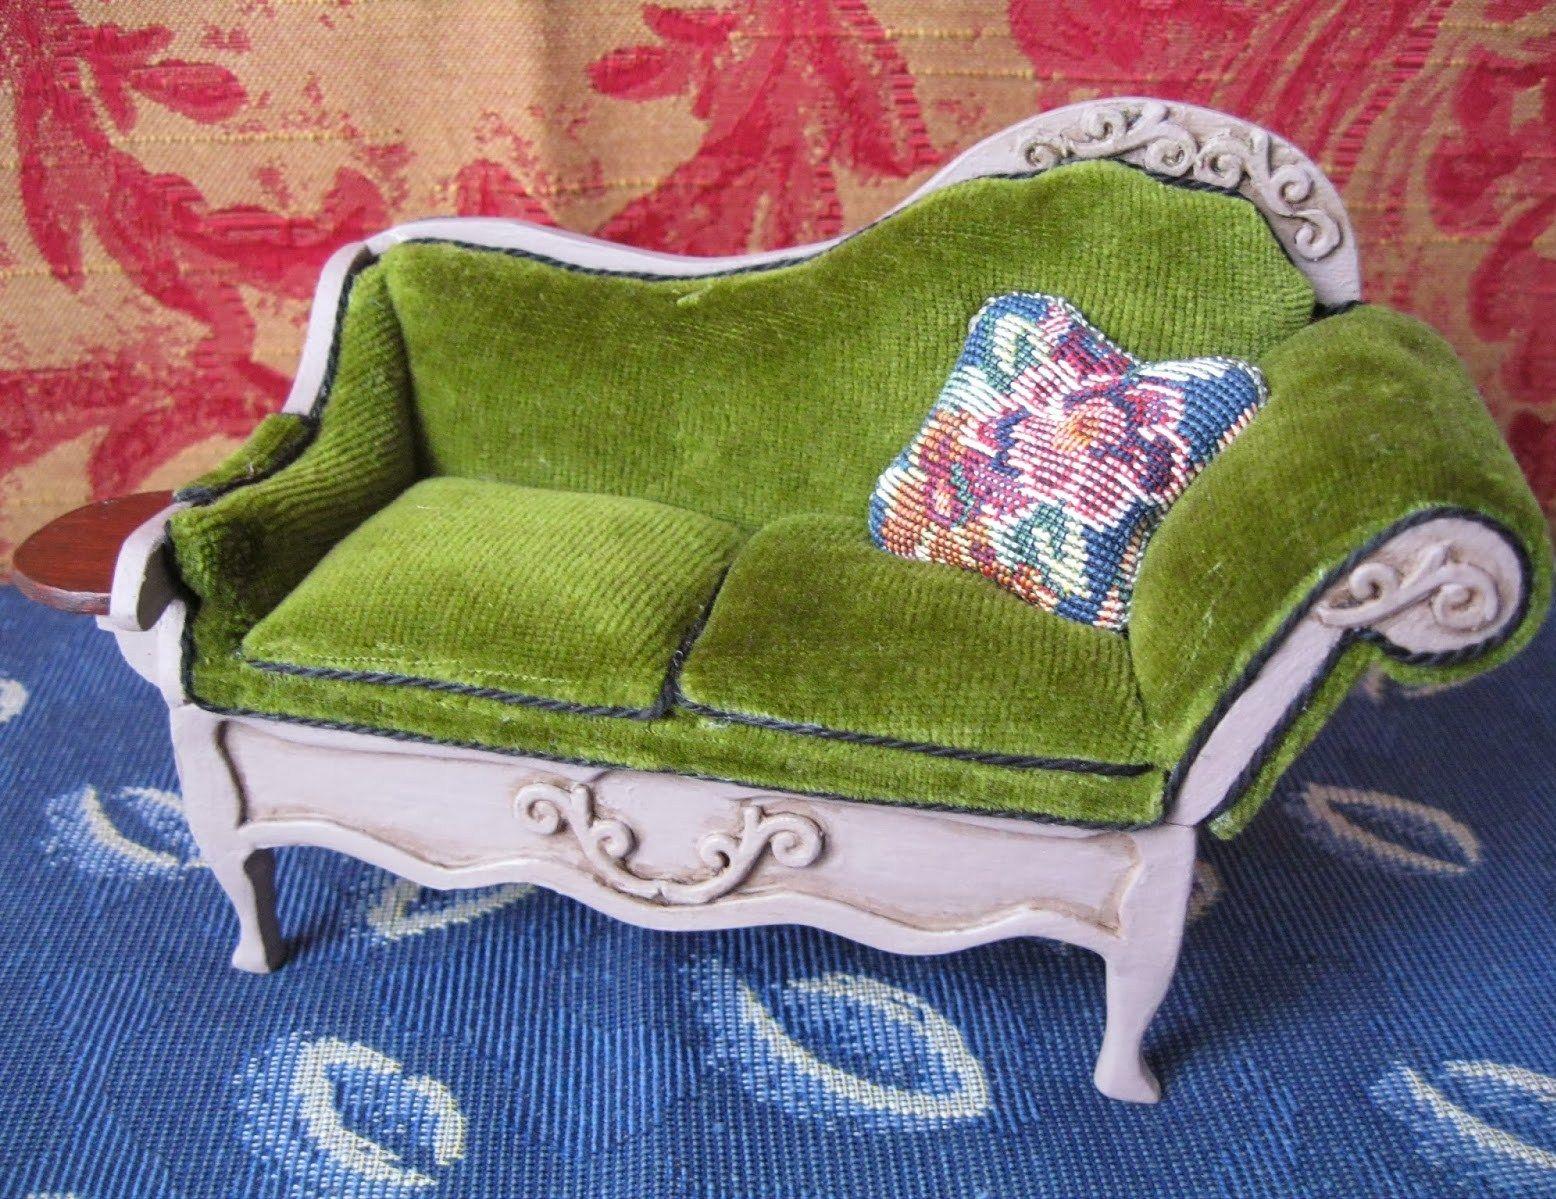 dollhouse sofa abbyson living durham leather pushback reclining how to miniature http pinterest dhminis